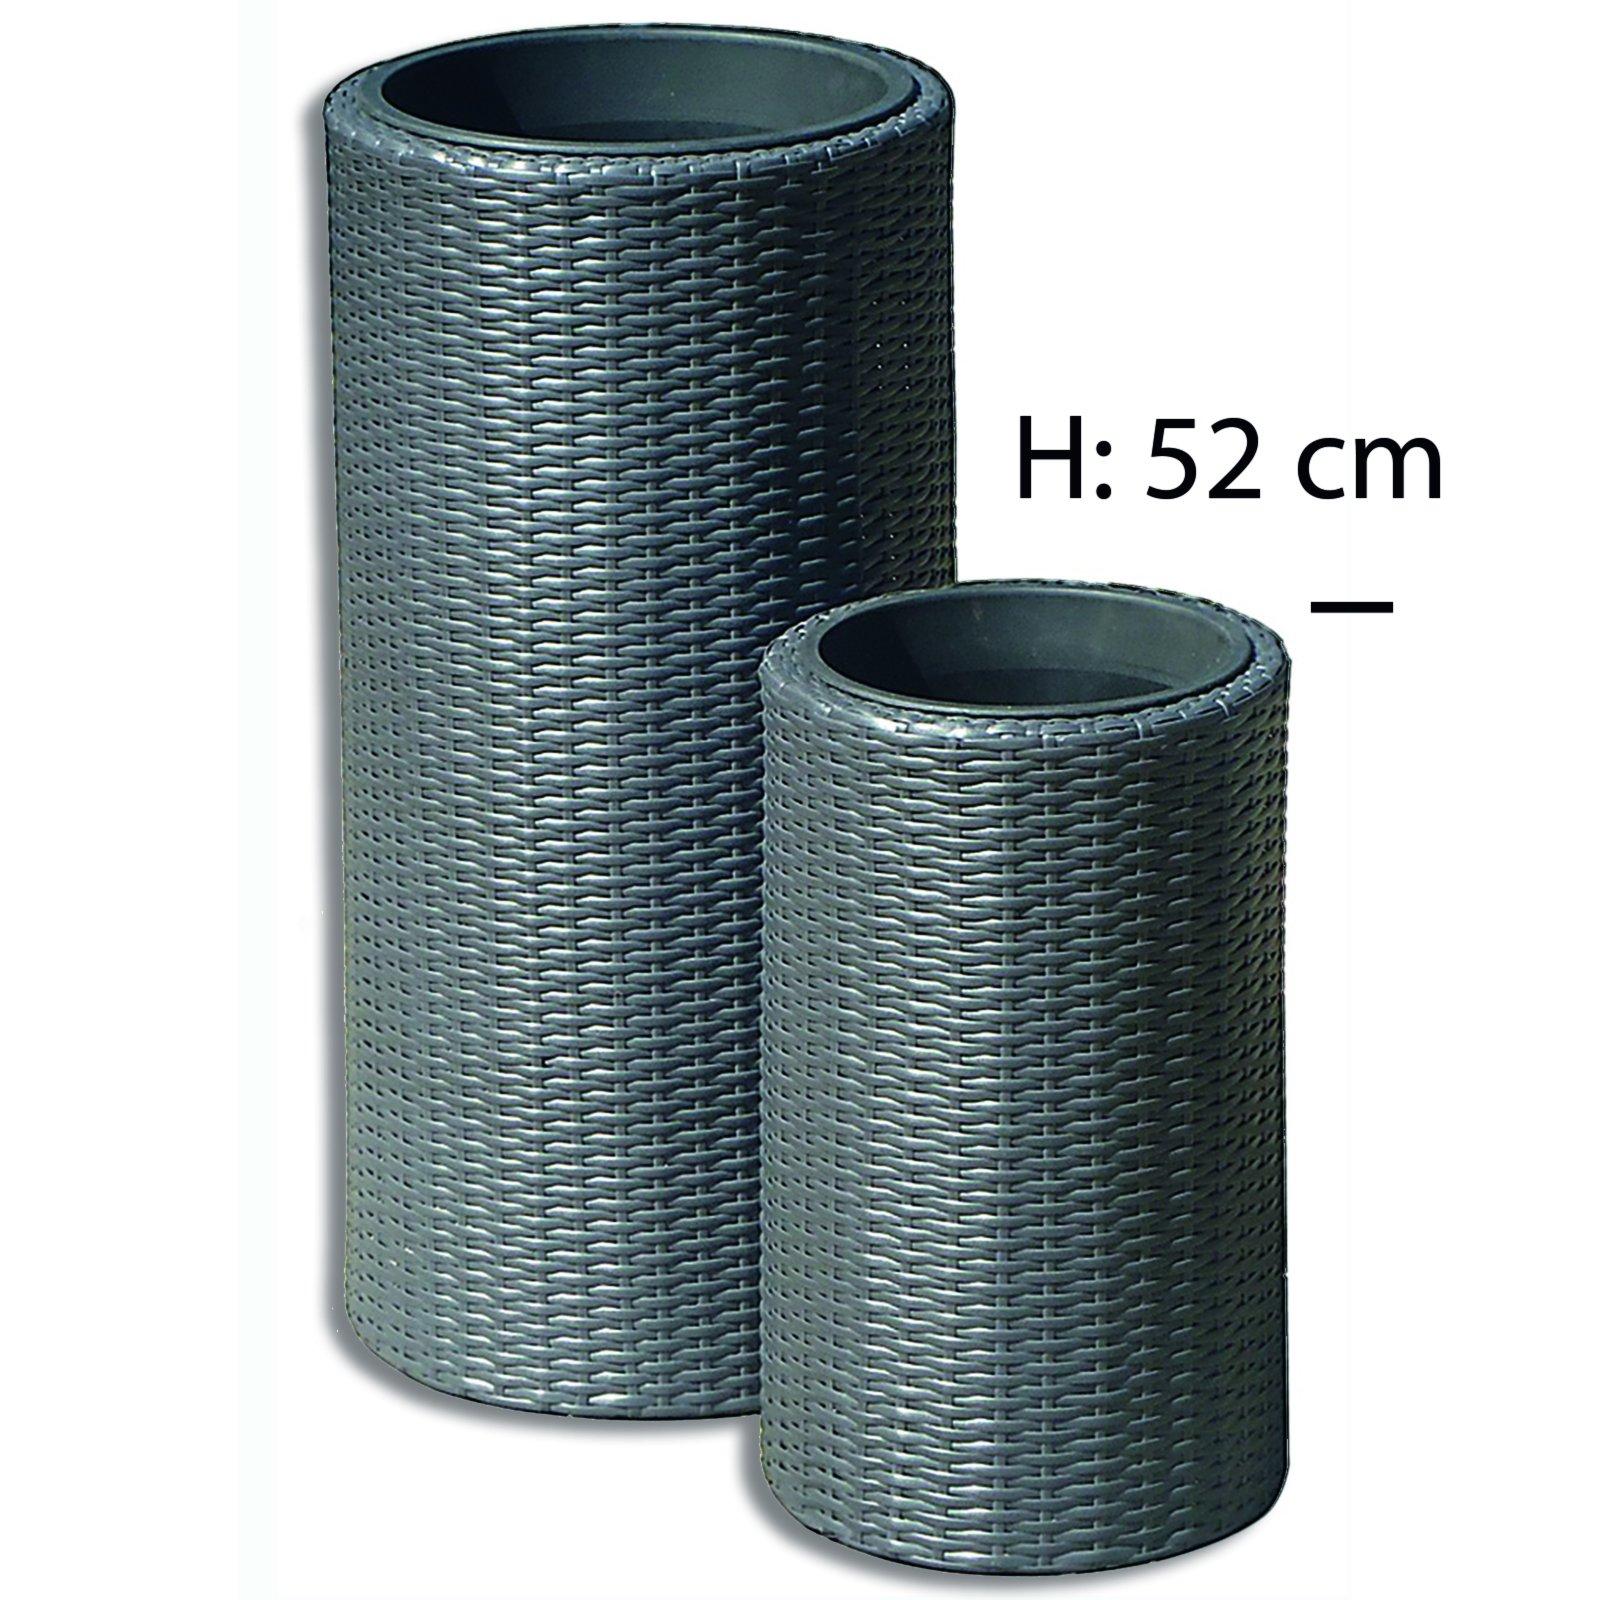 pflanzk bel grau rattan optik h he 52 cm blument pfe pflanzgef e gartenm bel. Black Bedroom Furniture Sets. Home Design Ideas